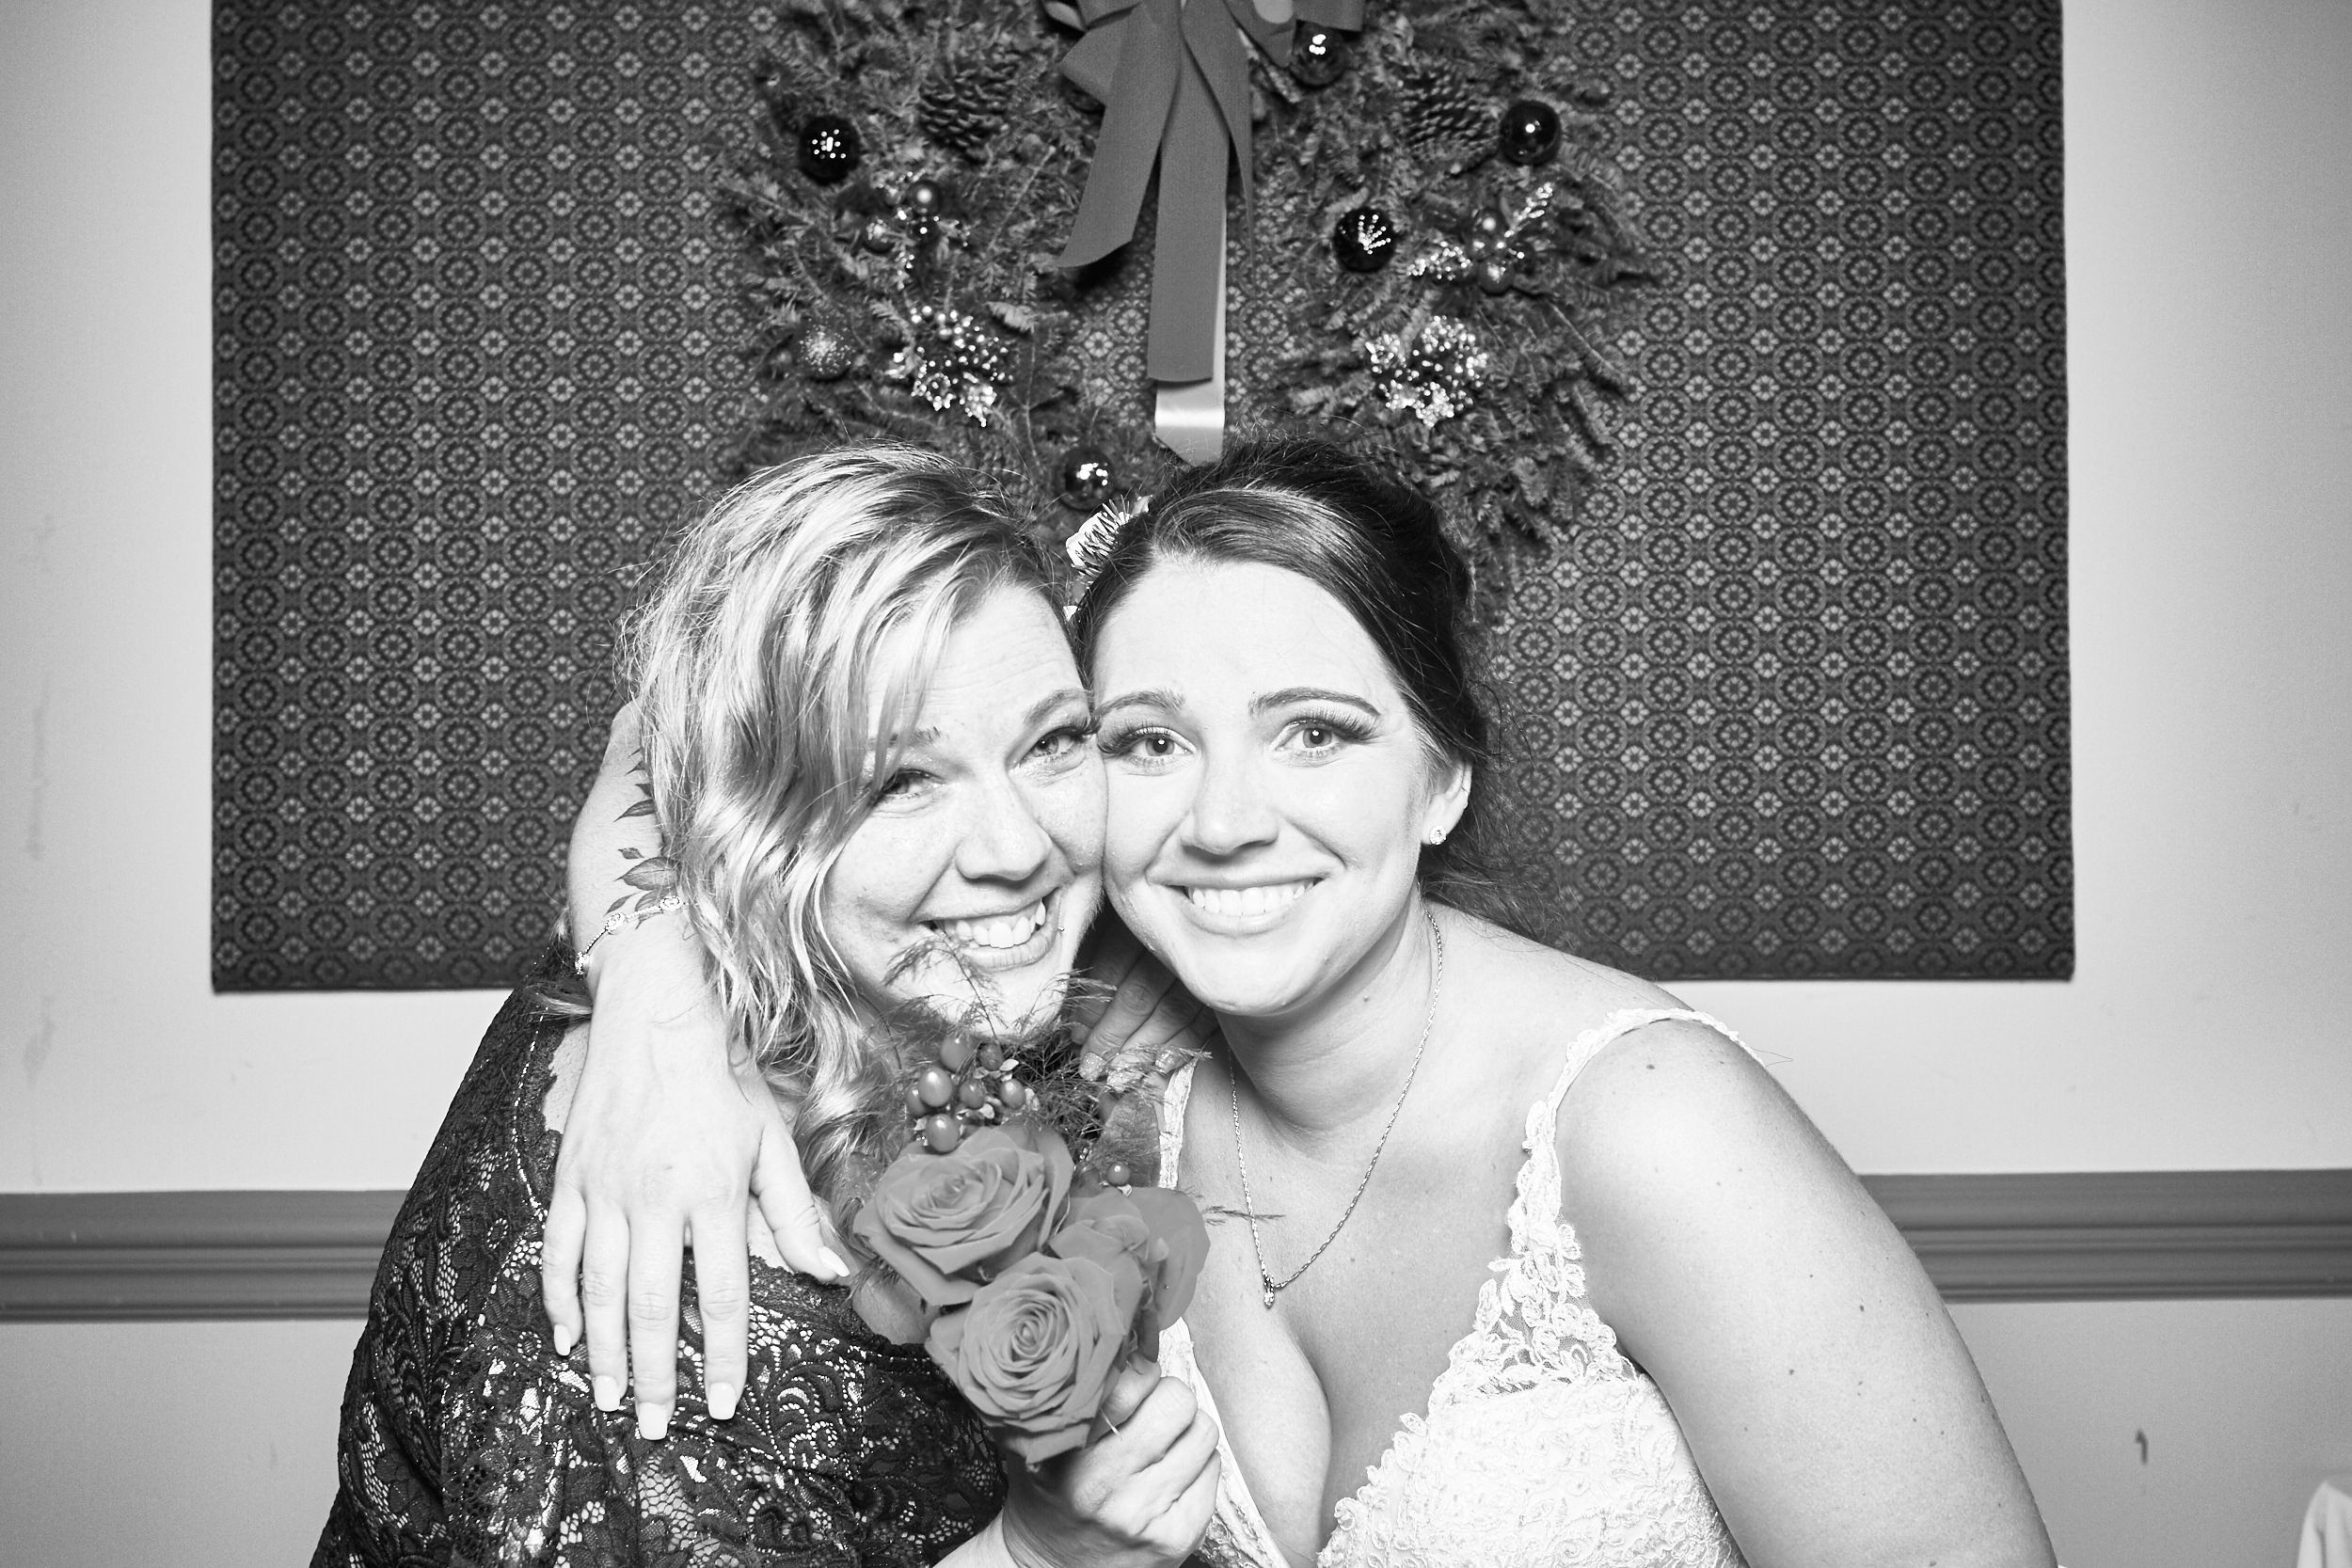 Alexa-James-Wedding-Photo-Booth991.jpg